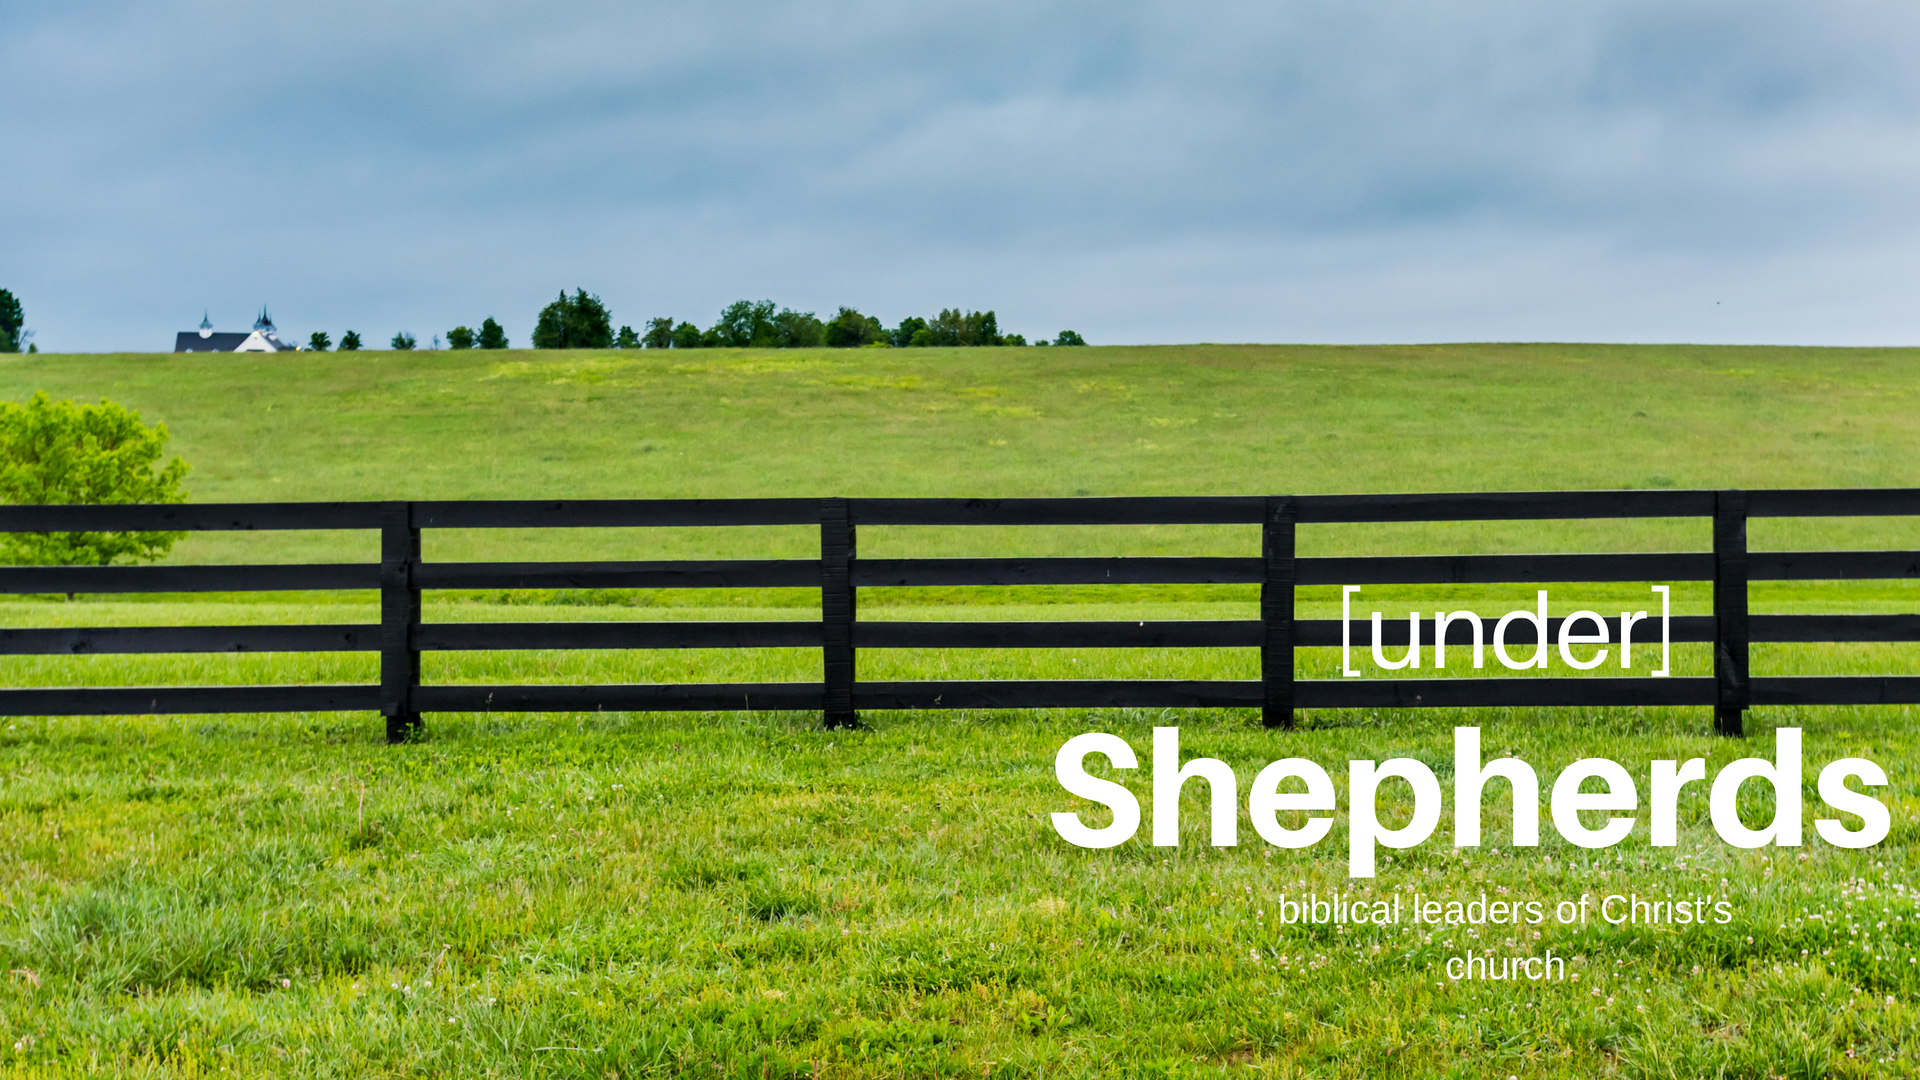 [under] Shepherds.jpg